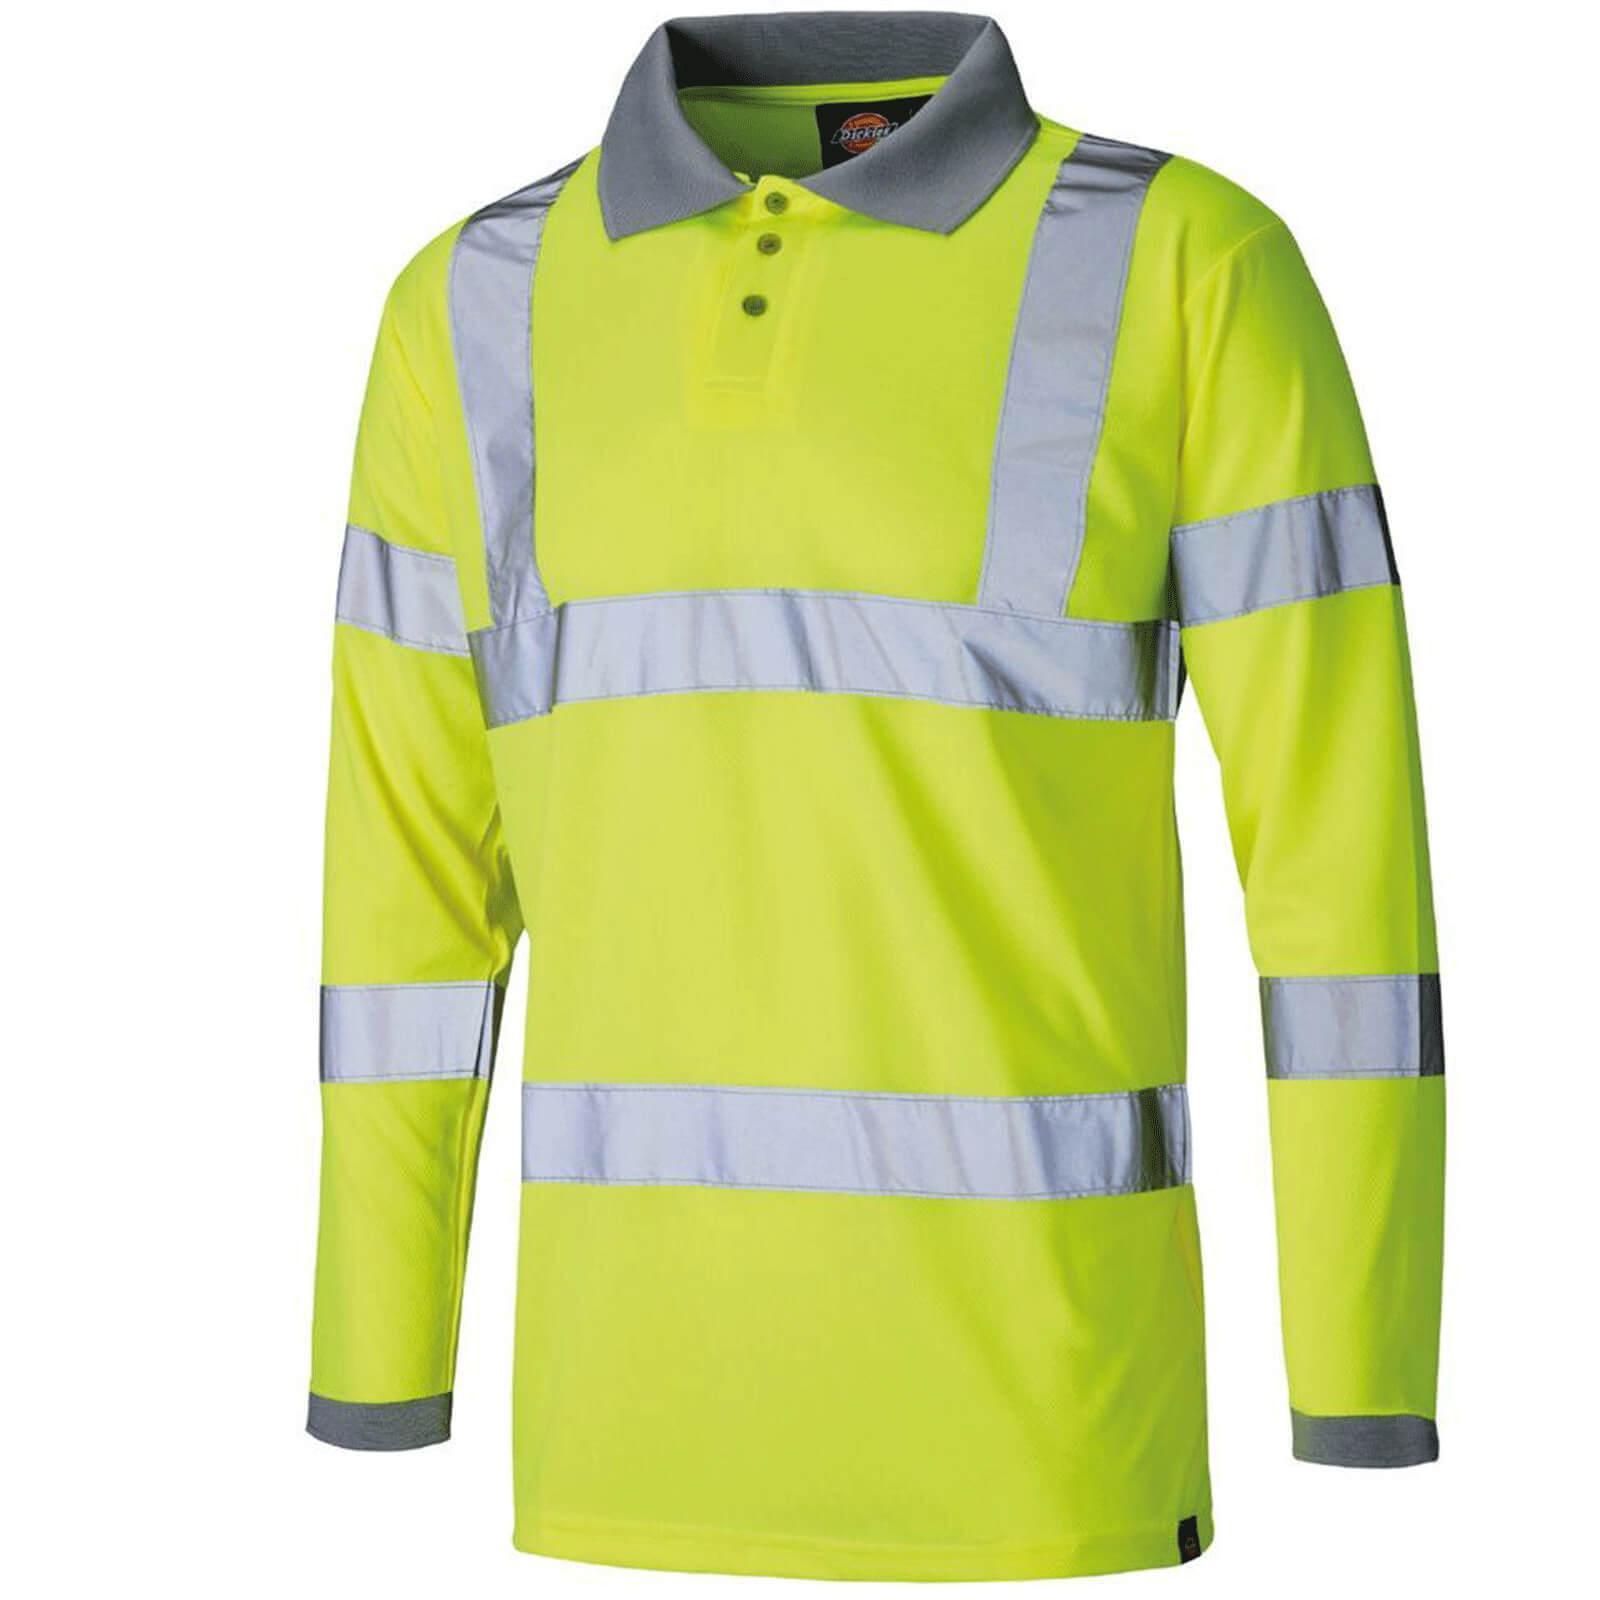 Image of Dickies Mens High Visibility Long Sleeve Polo Shirt Yellow 3XL